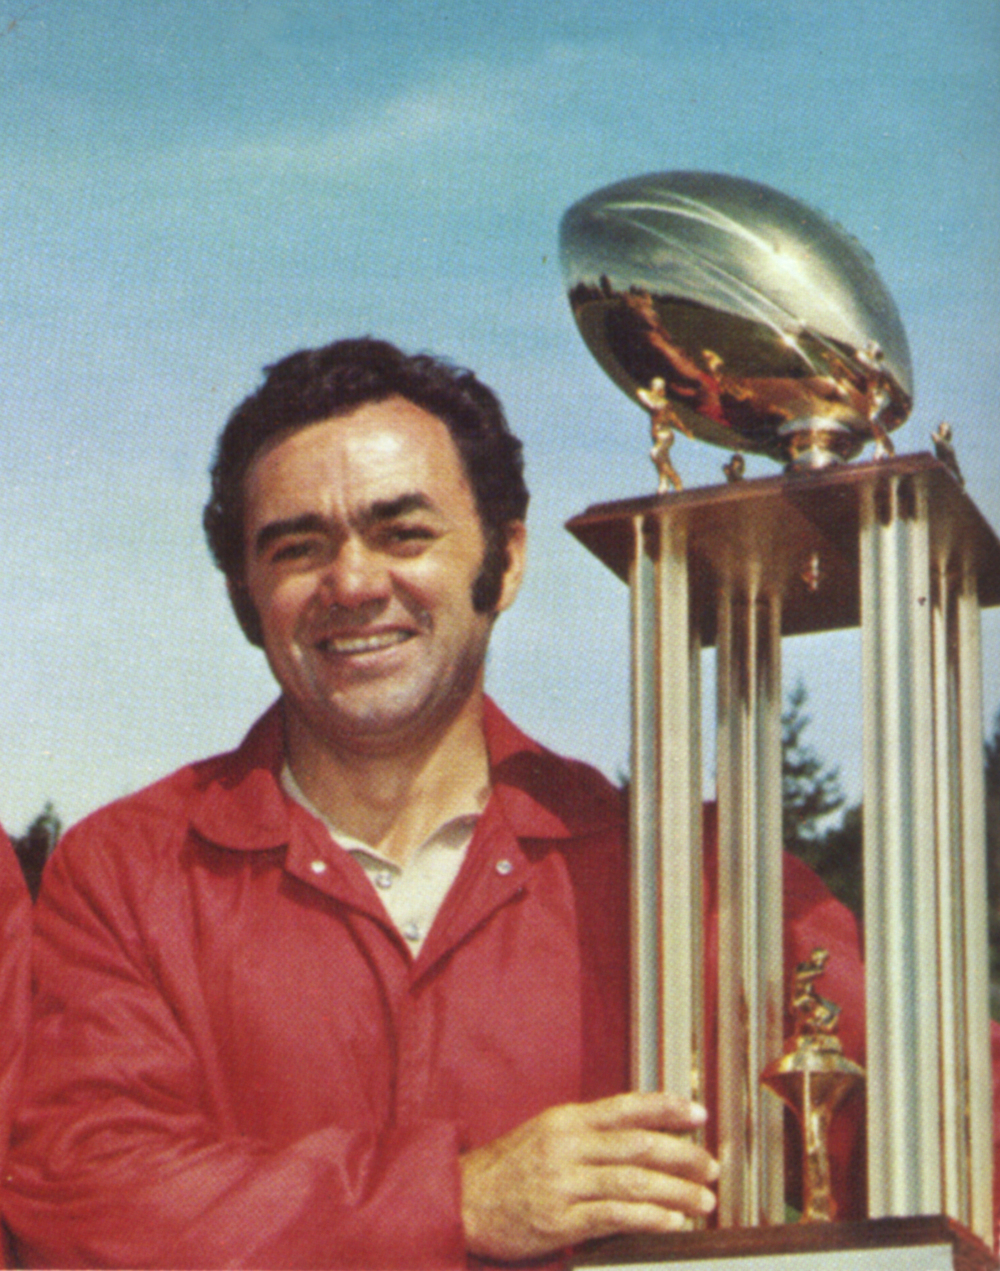 O.A.L. championship trophy, 1974